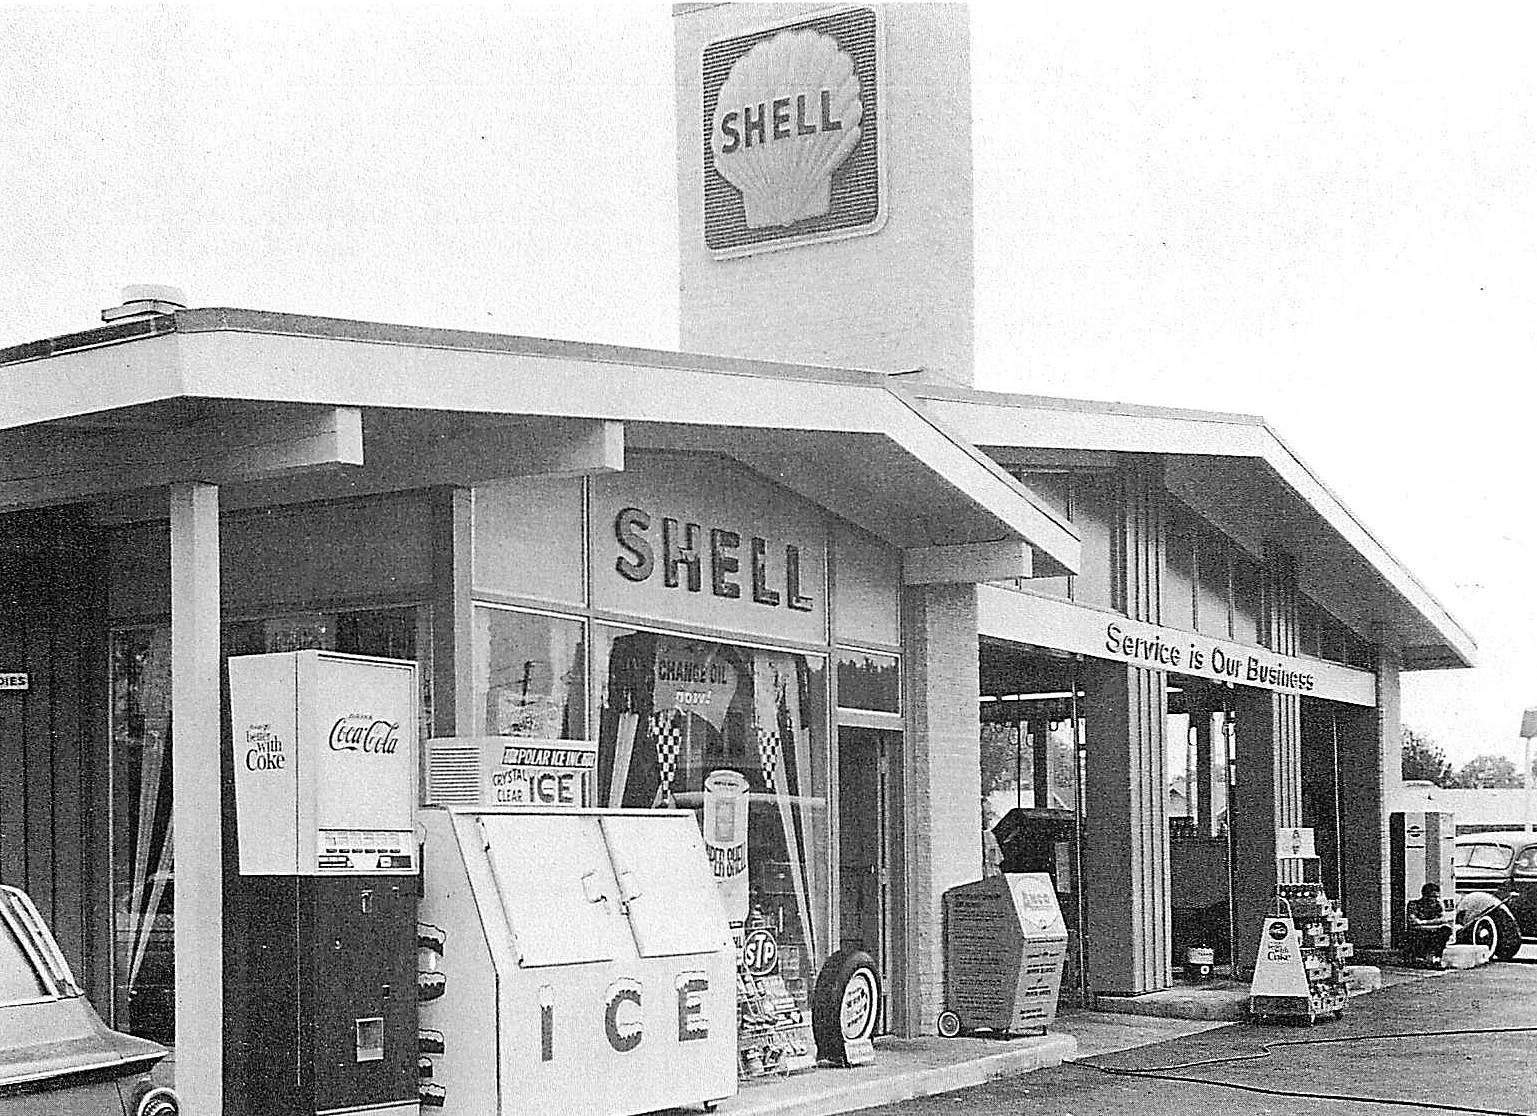 Shell Service Station, 1960's